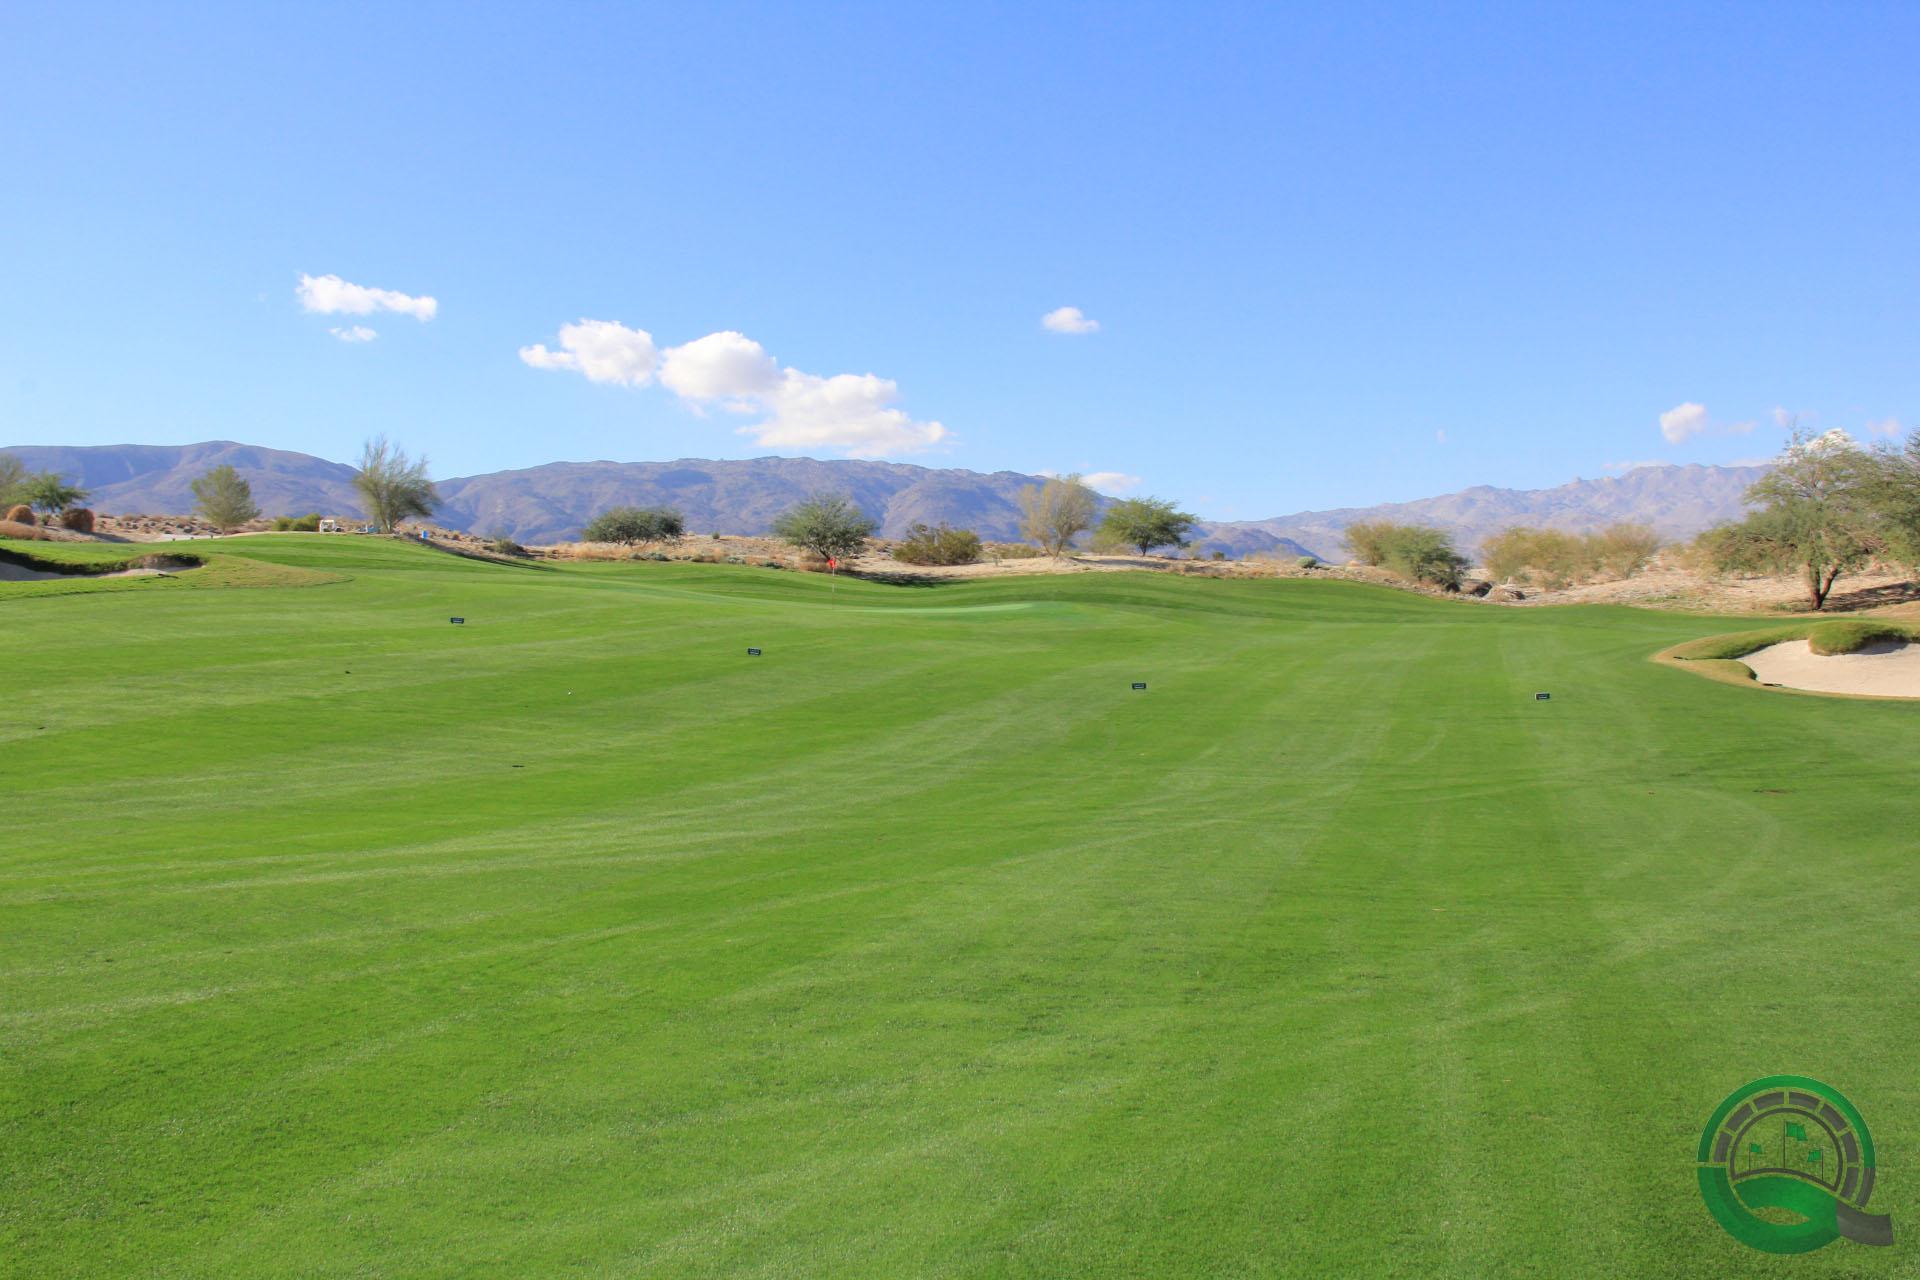 Rams Hill Golf Club Hole 6 Fairway